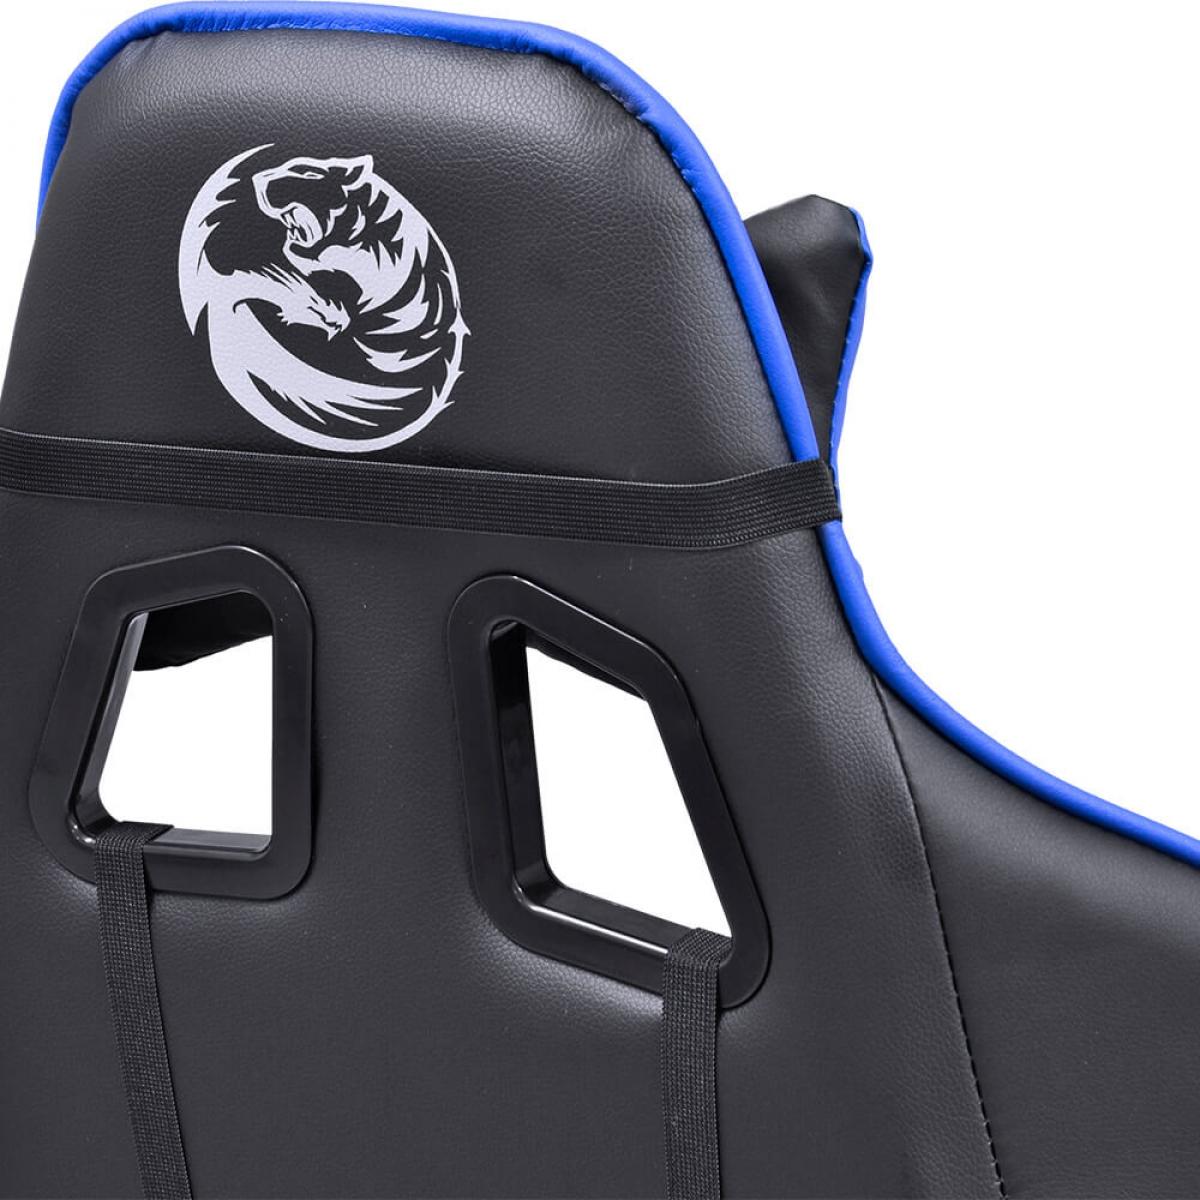 Cadeira Gamer PCYes Mad Racer V8, Black-Blue, MADV8AZGL